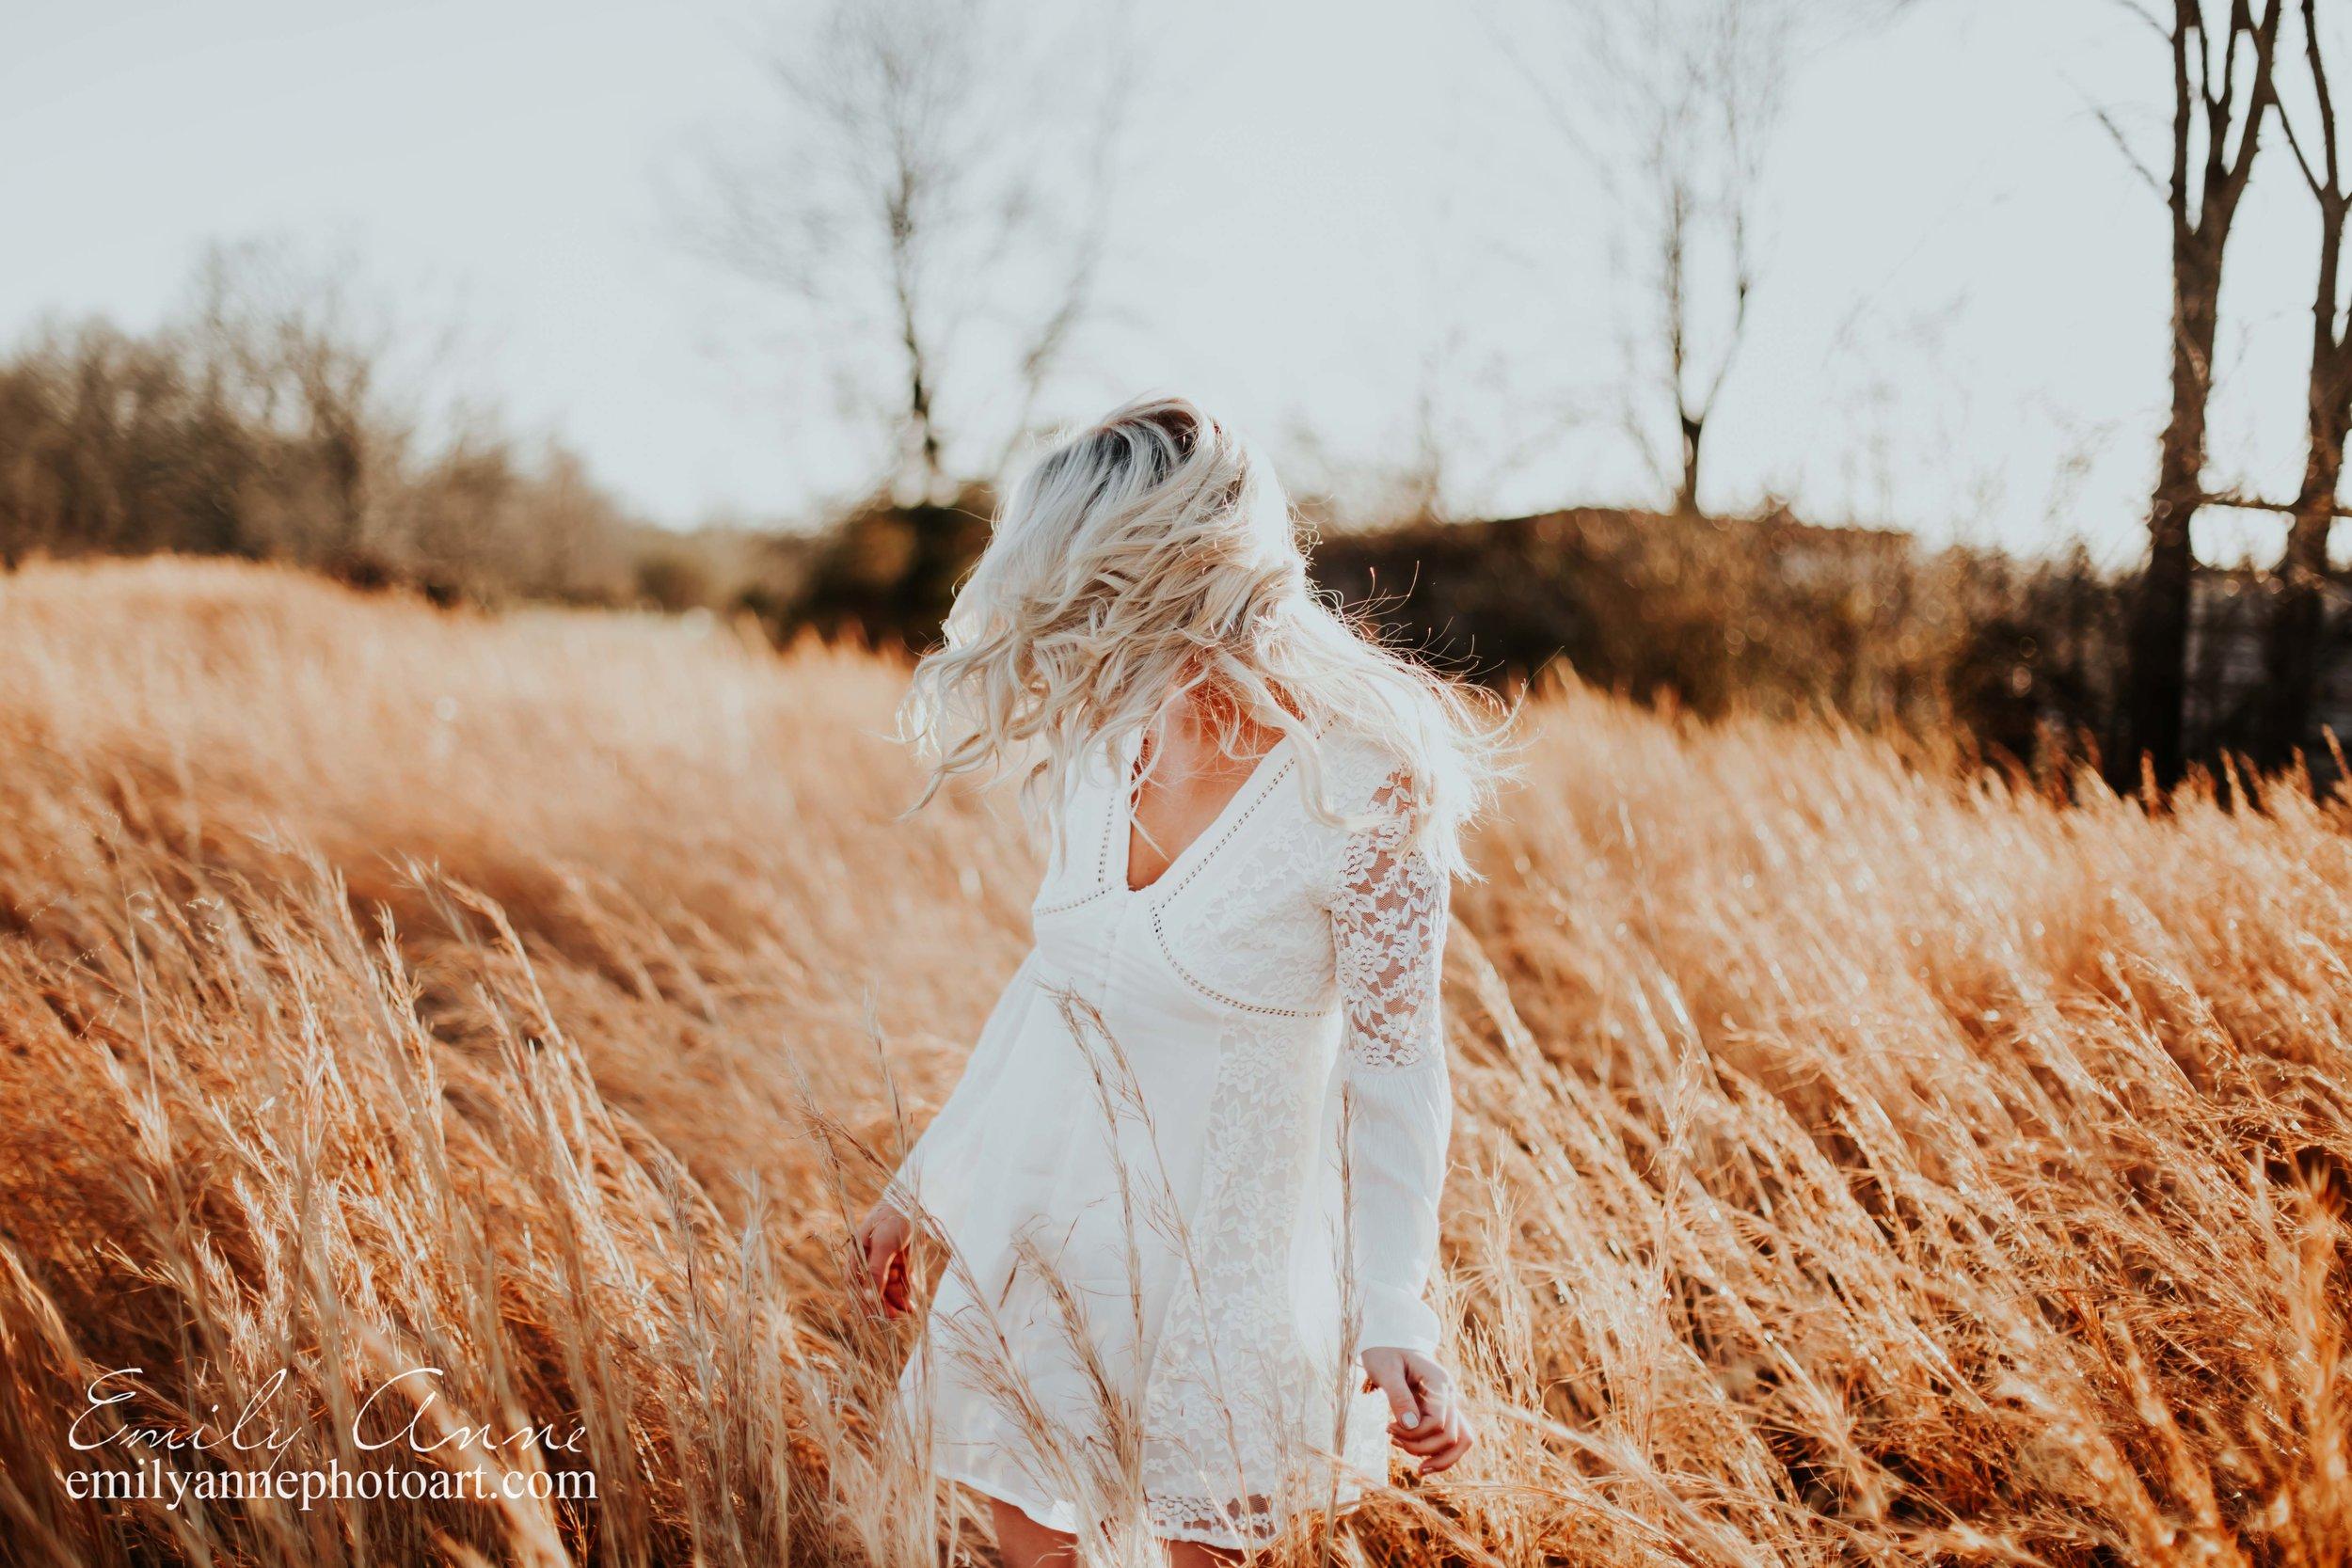 fun golden sunset senior portrait photography nashville/franklin/brentwood tn